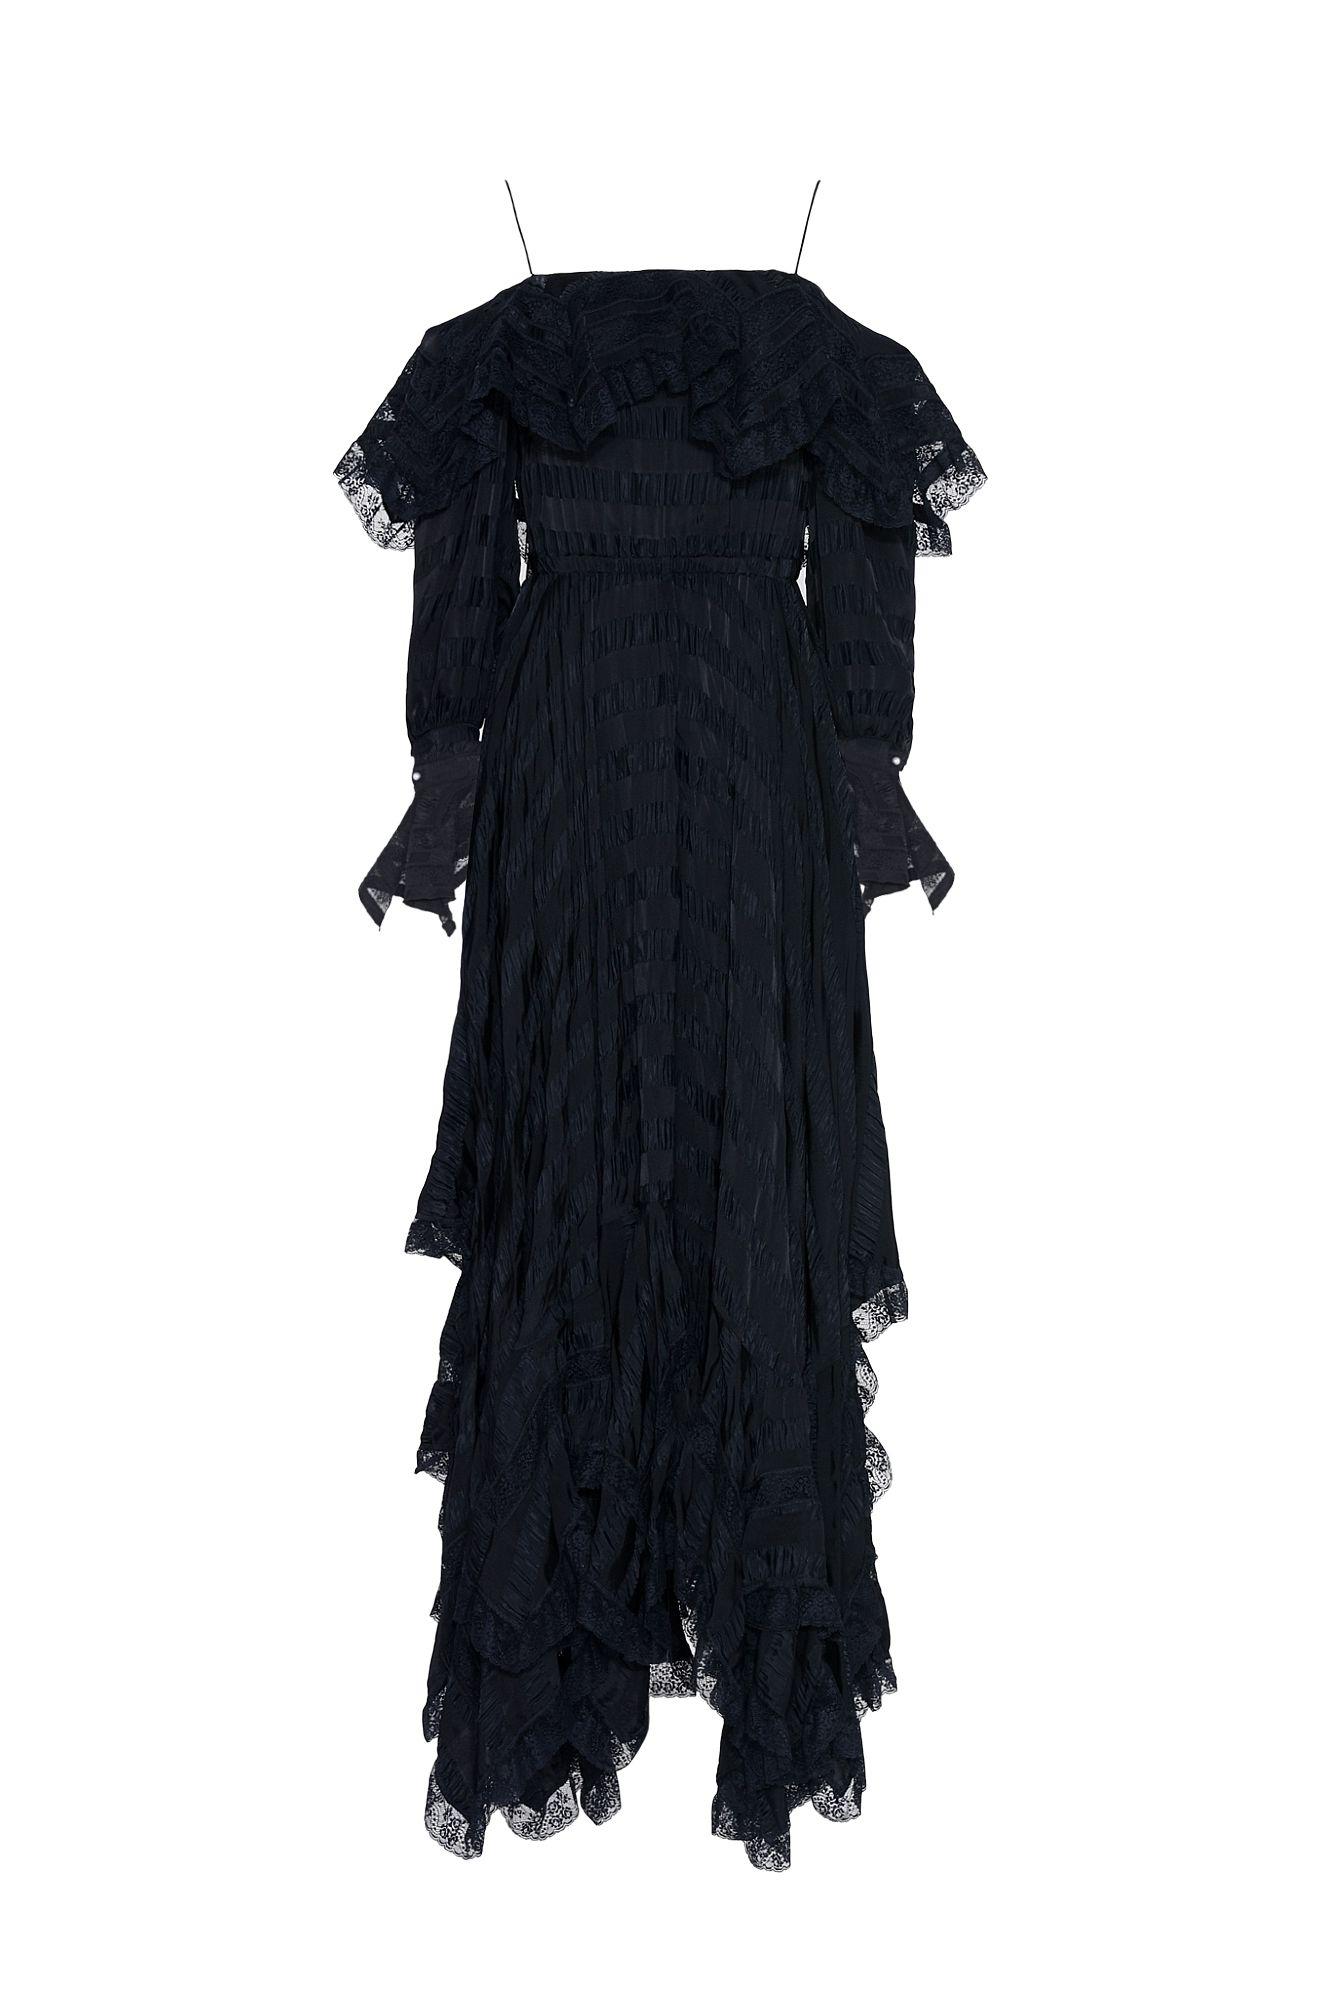 CORSAIR BLACK DRESS